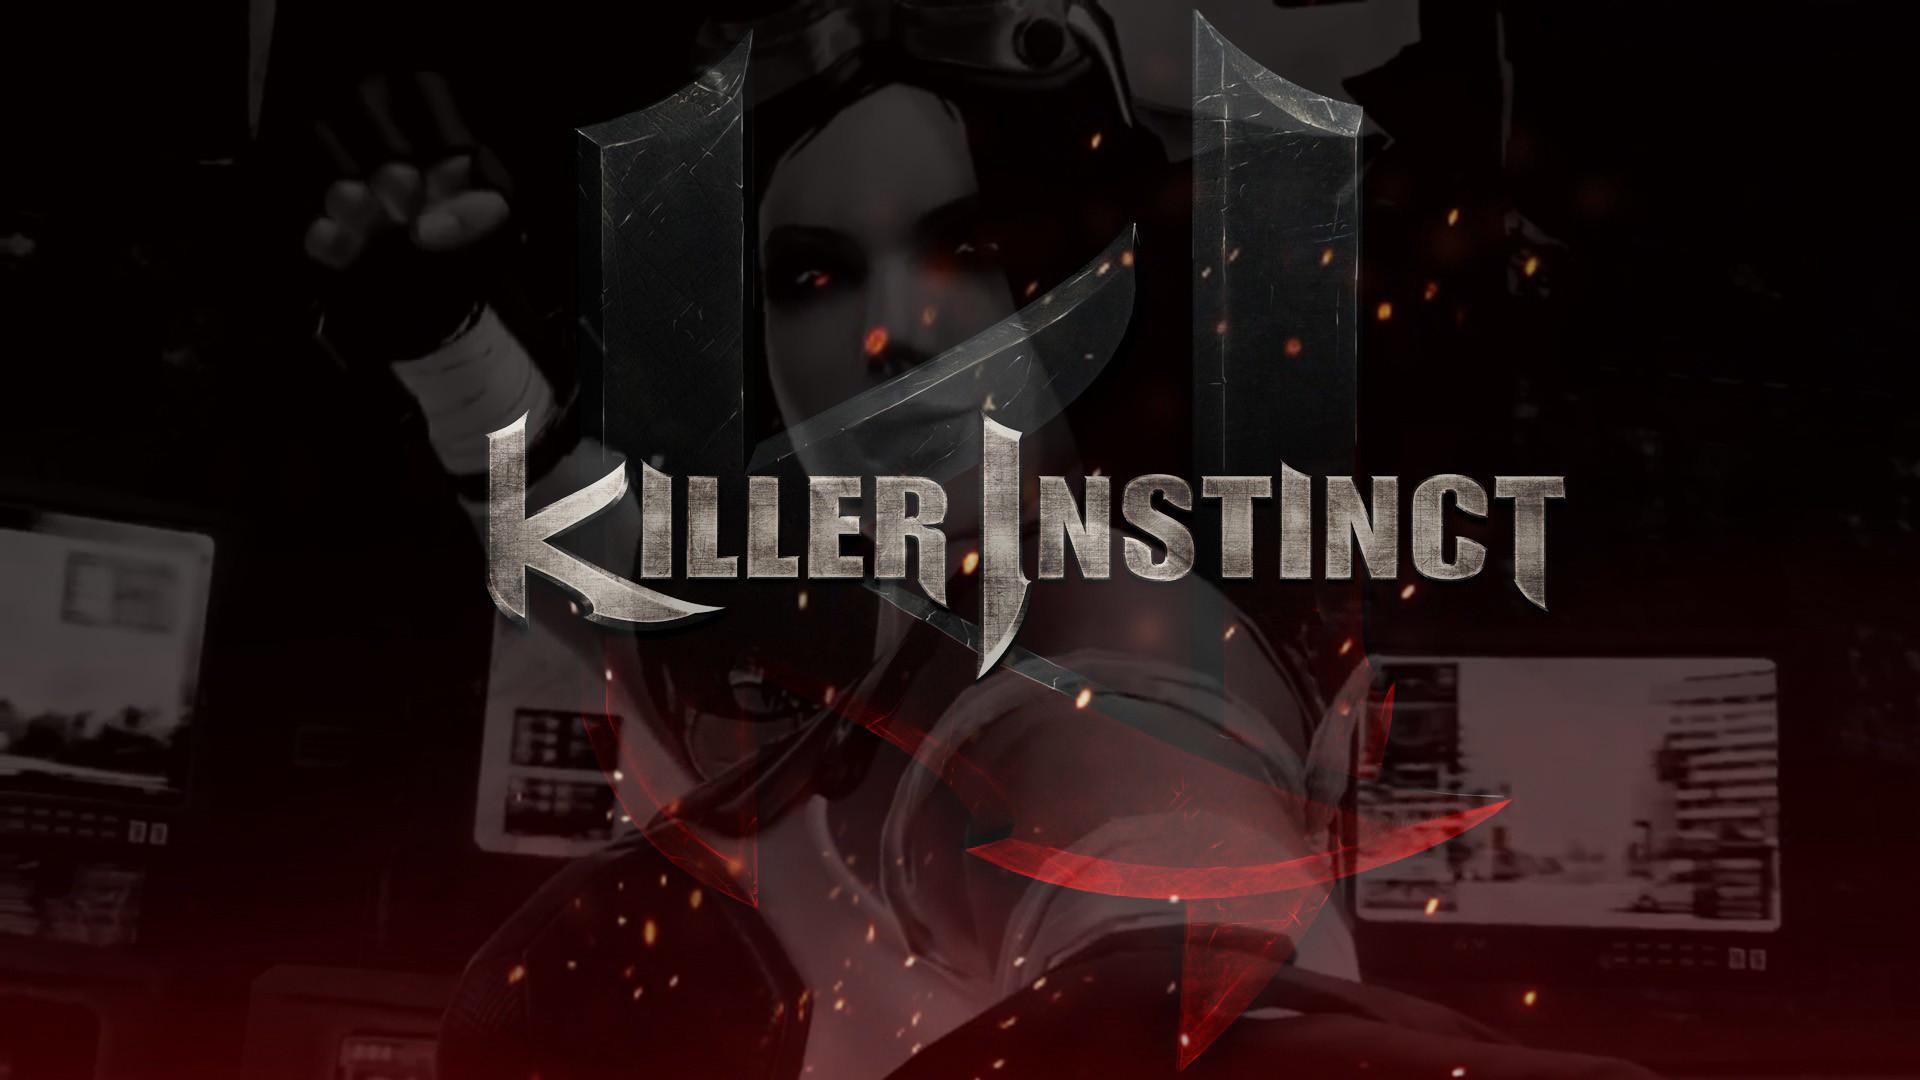 killer_instinct_3___b__orchid_wallpaper_1920x1080_by_thefoxcutter